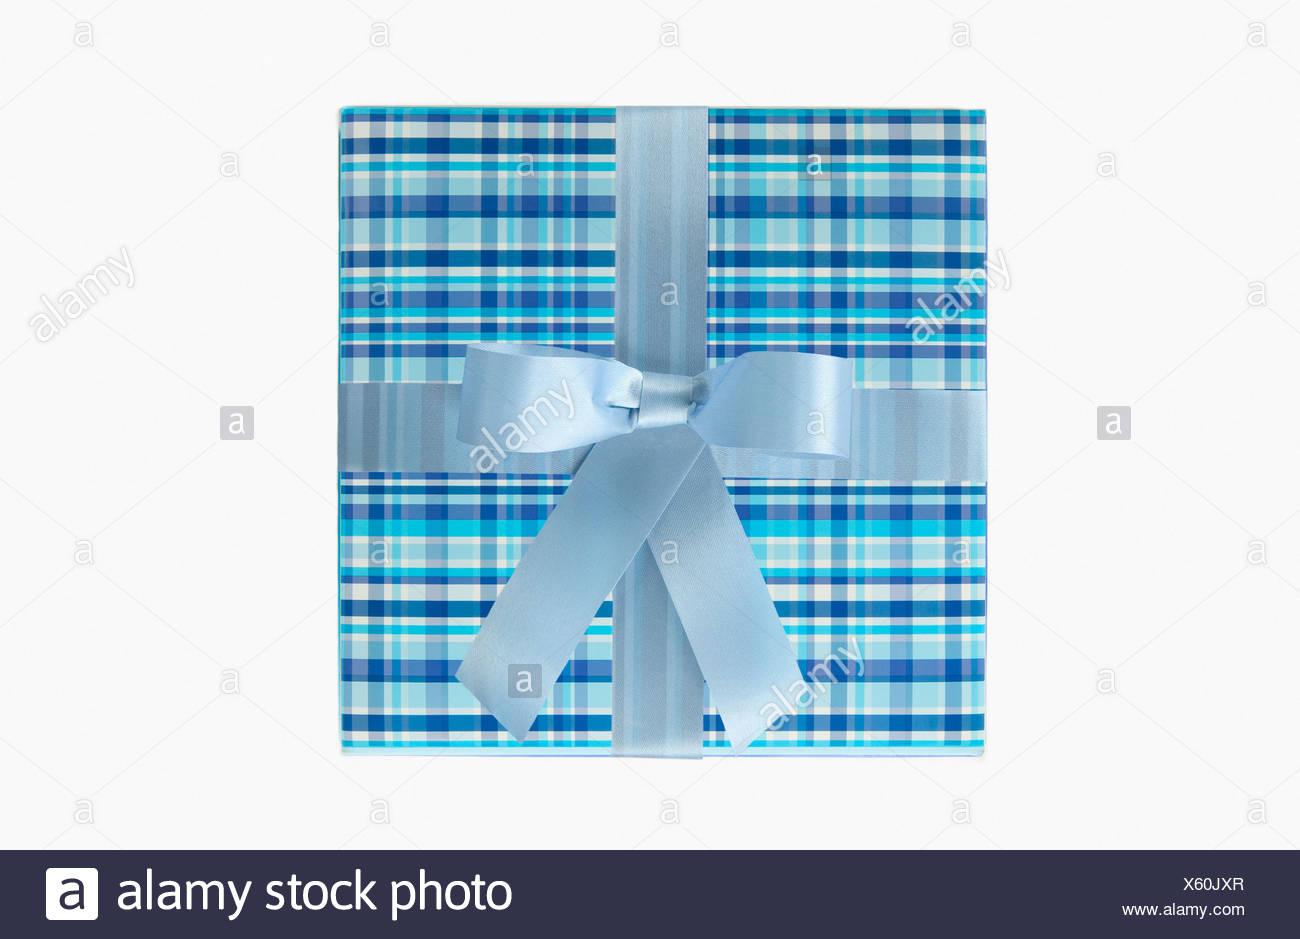 Blue gift box - Stock Image